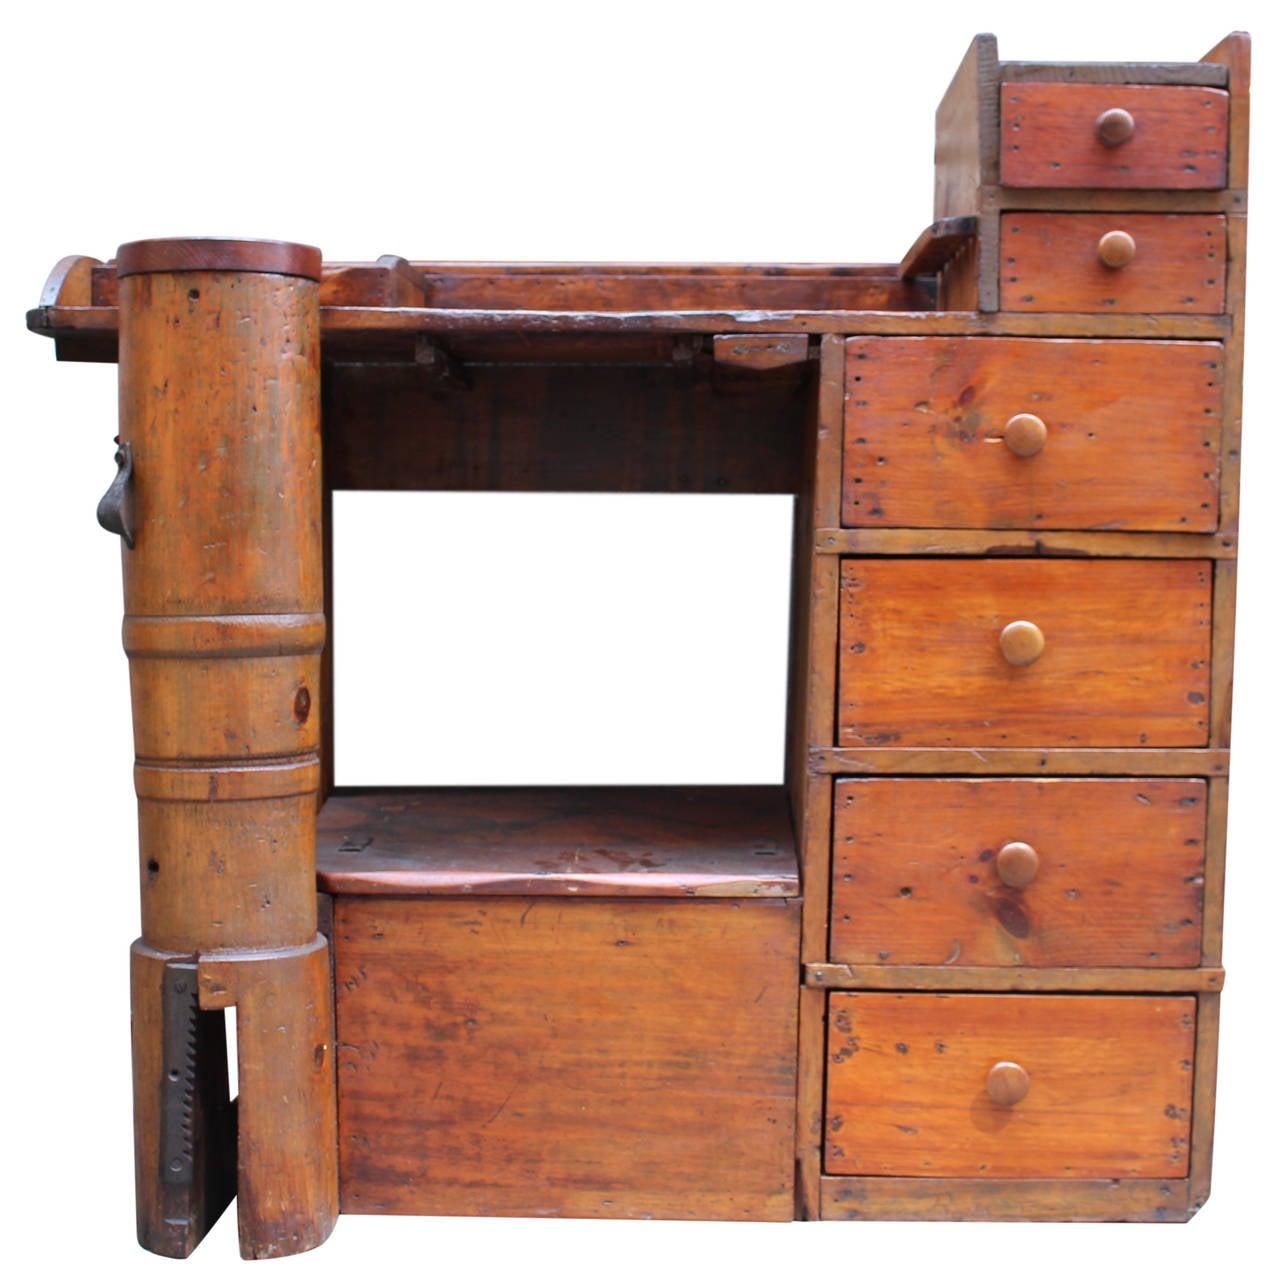 1880s Antique Pine Shoe Cobbler Work Desk with Drawers and Cubbyholes 1 - 1880s Antique Pine Shoe Cobbler Work Desk With Drawers And